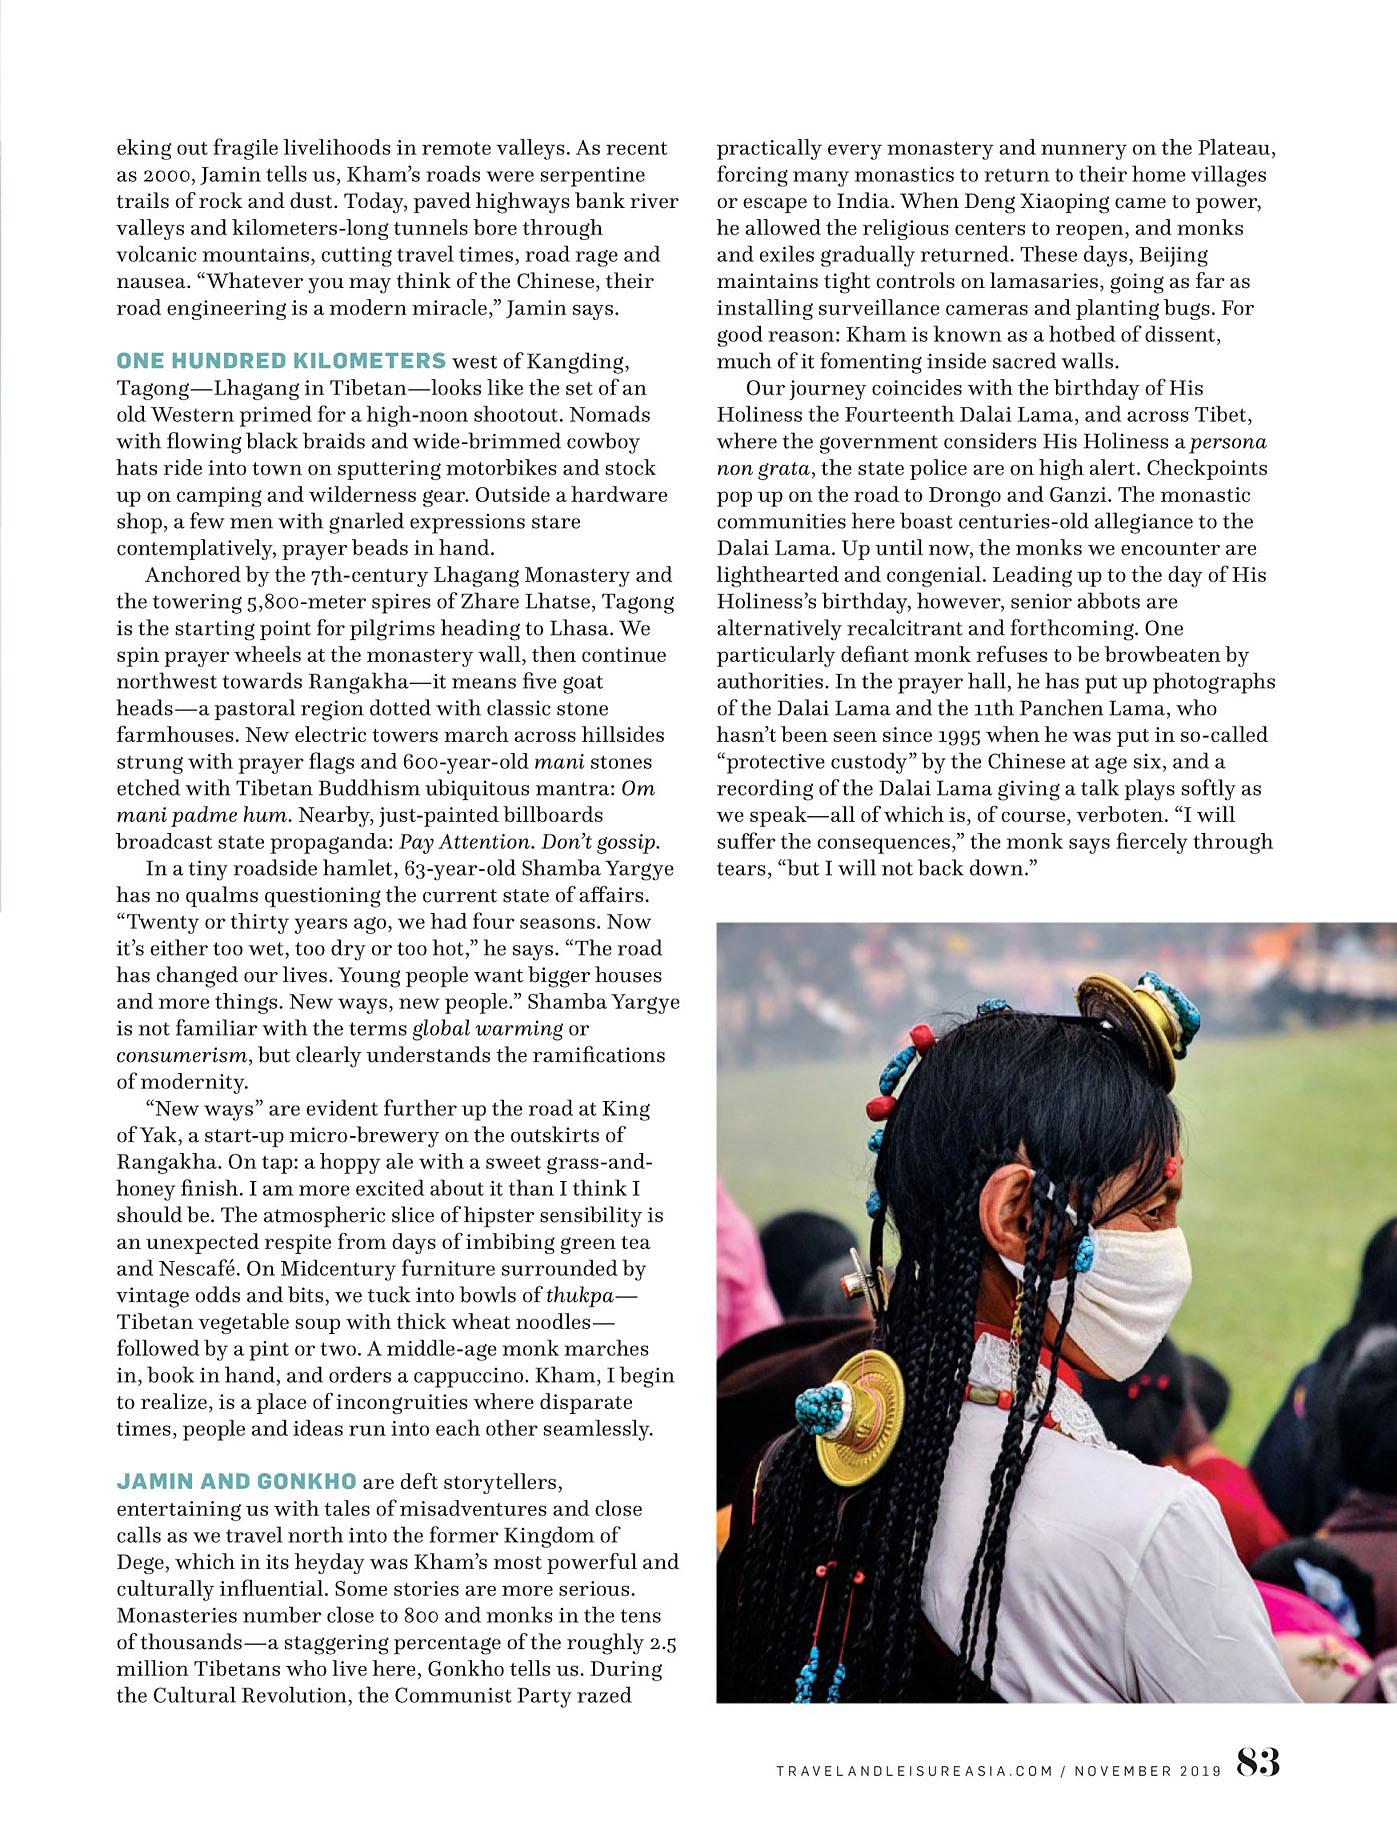 Travel & Leisure SE Asia 2019-11 Tibet 08.jpg